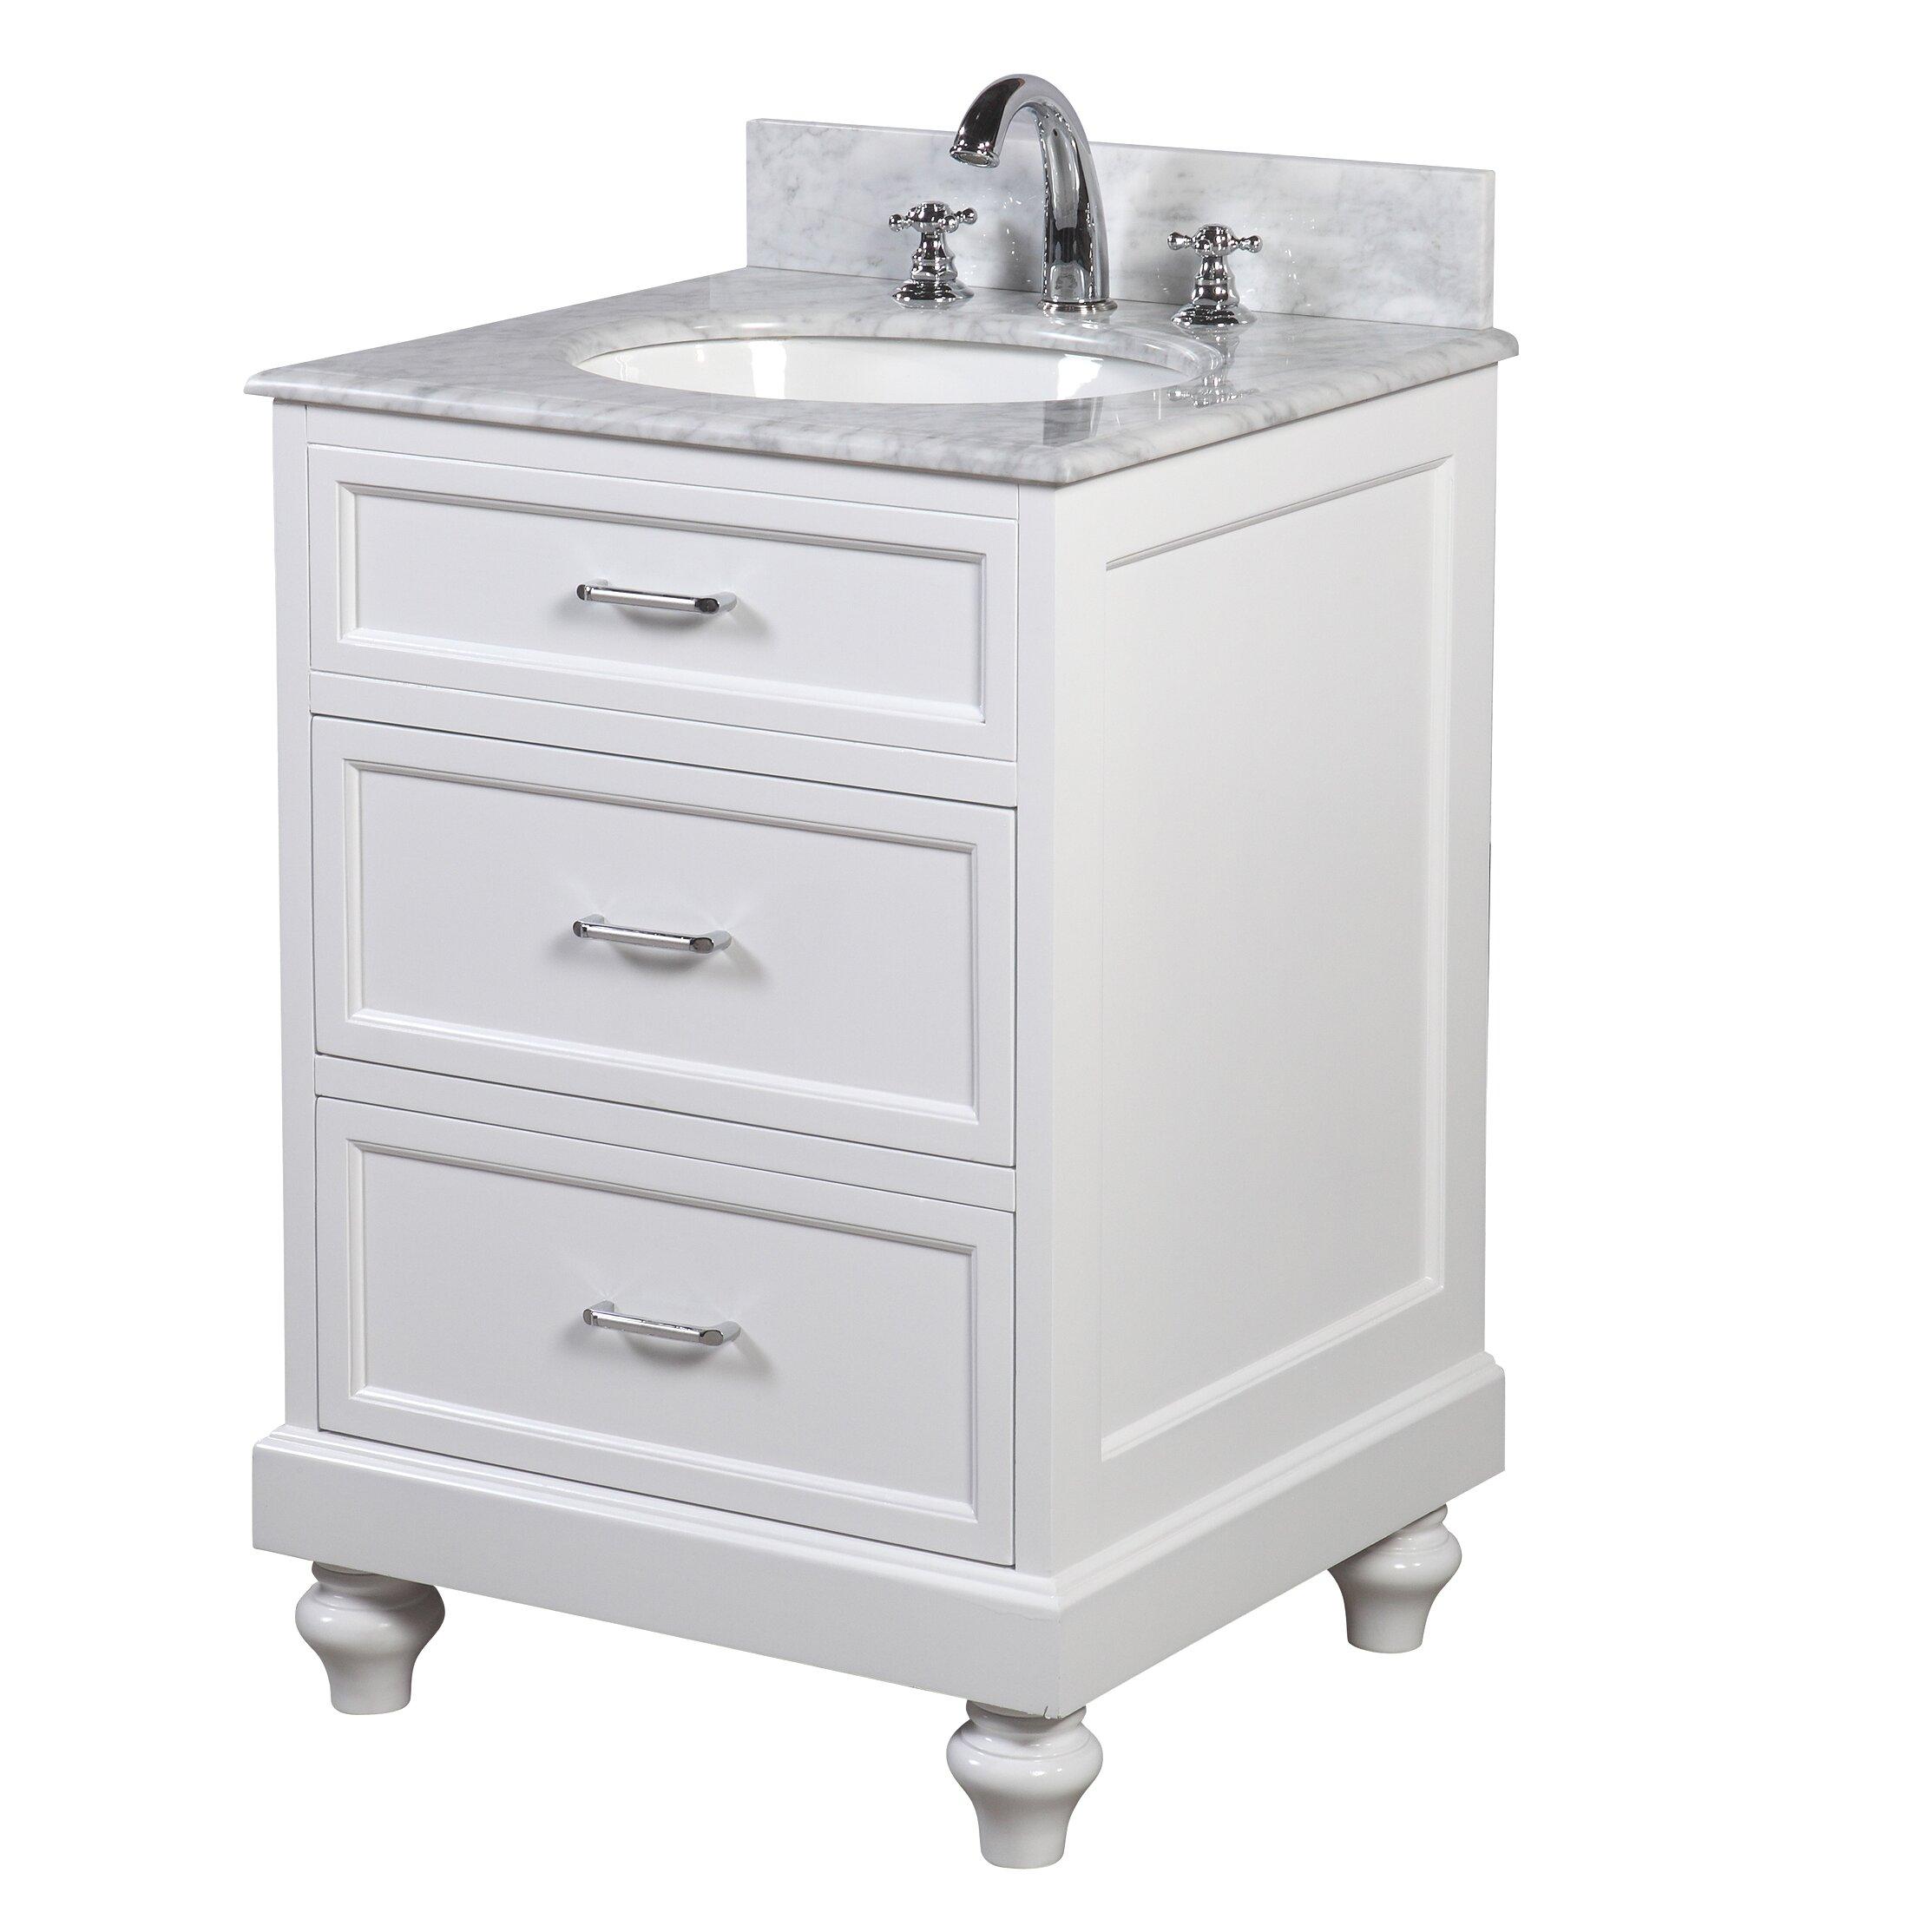 kitchen bath collection amelia 24 single bathroom vanity set